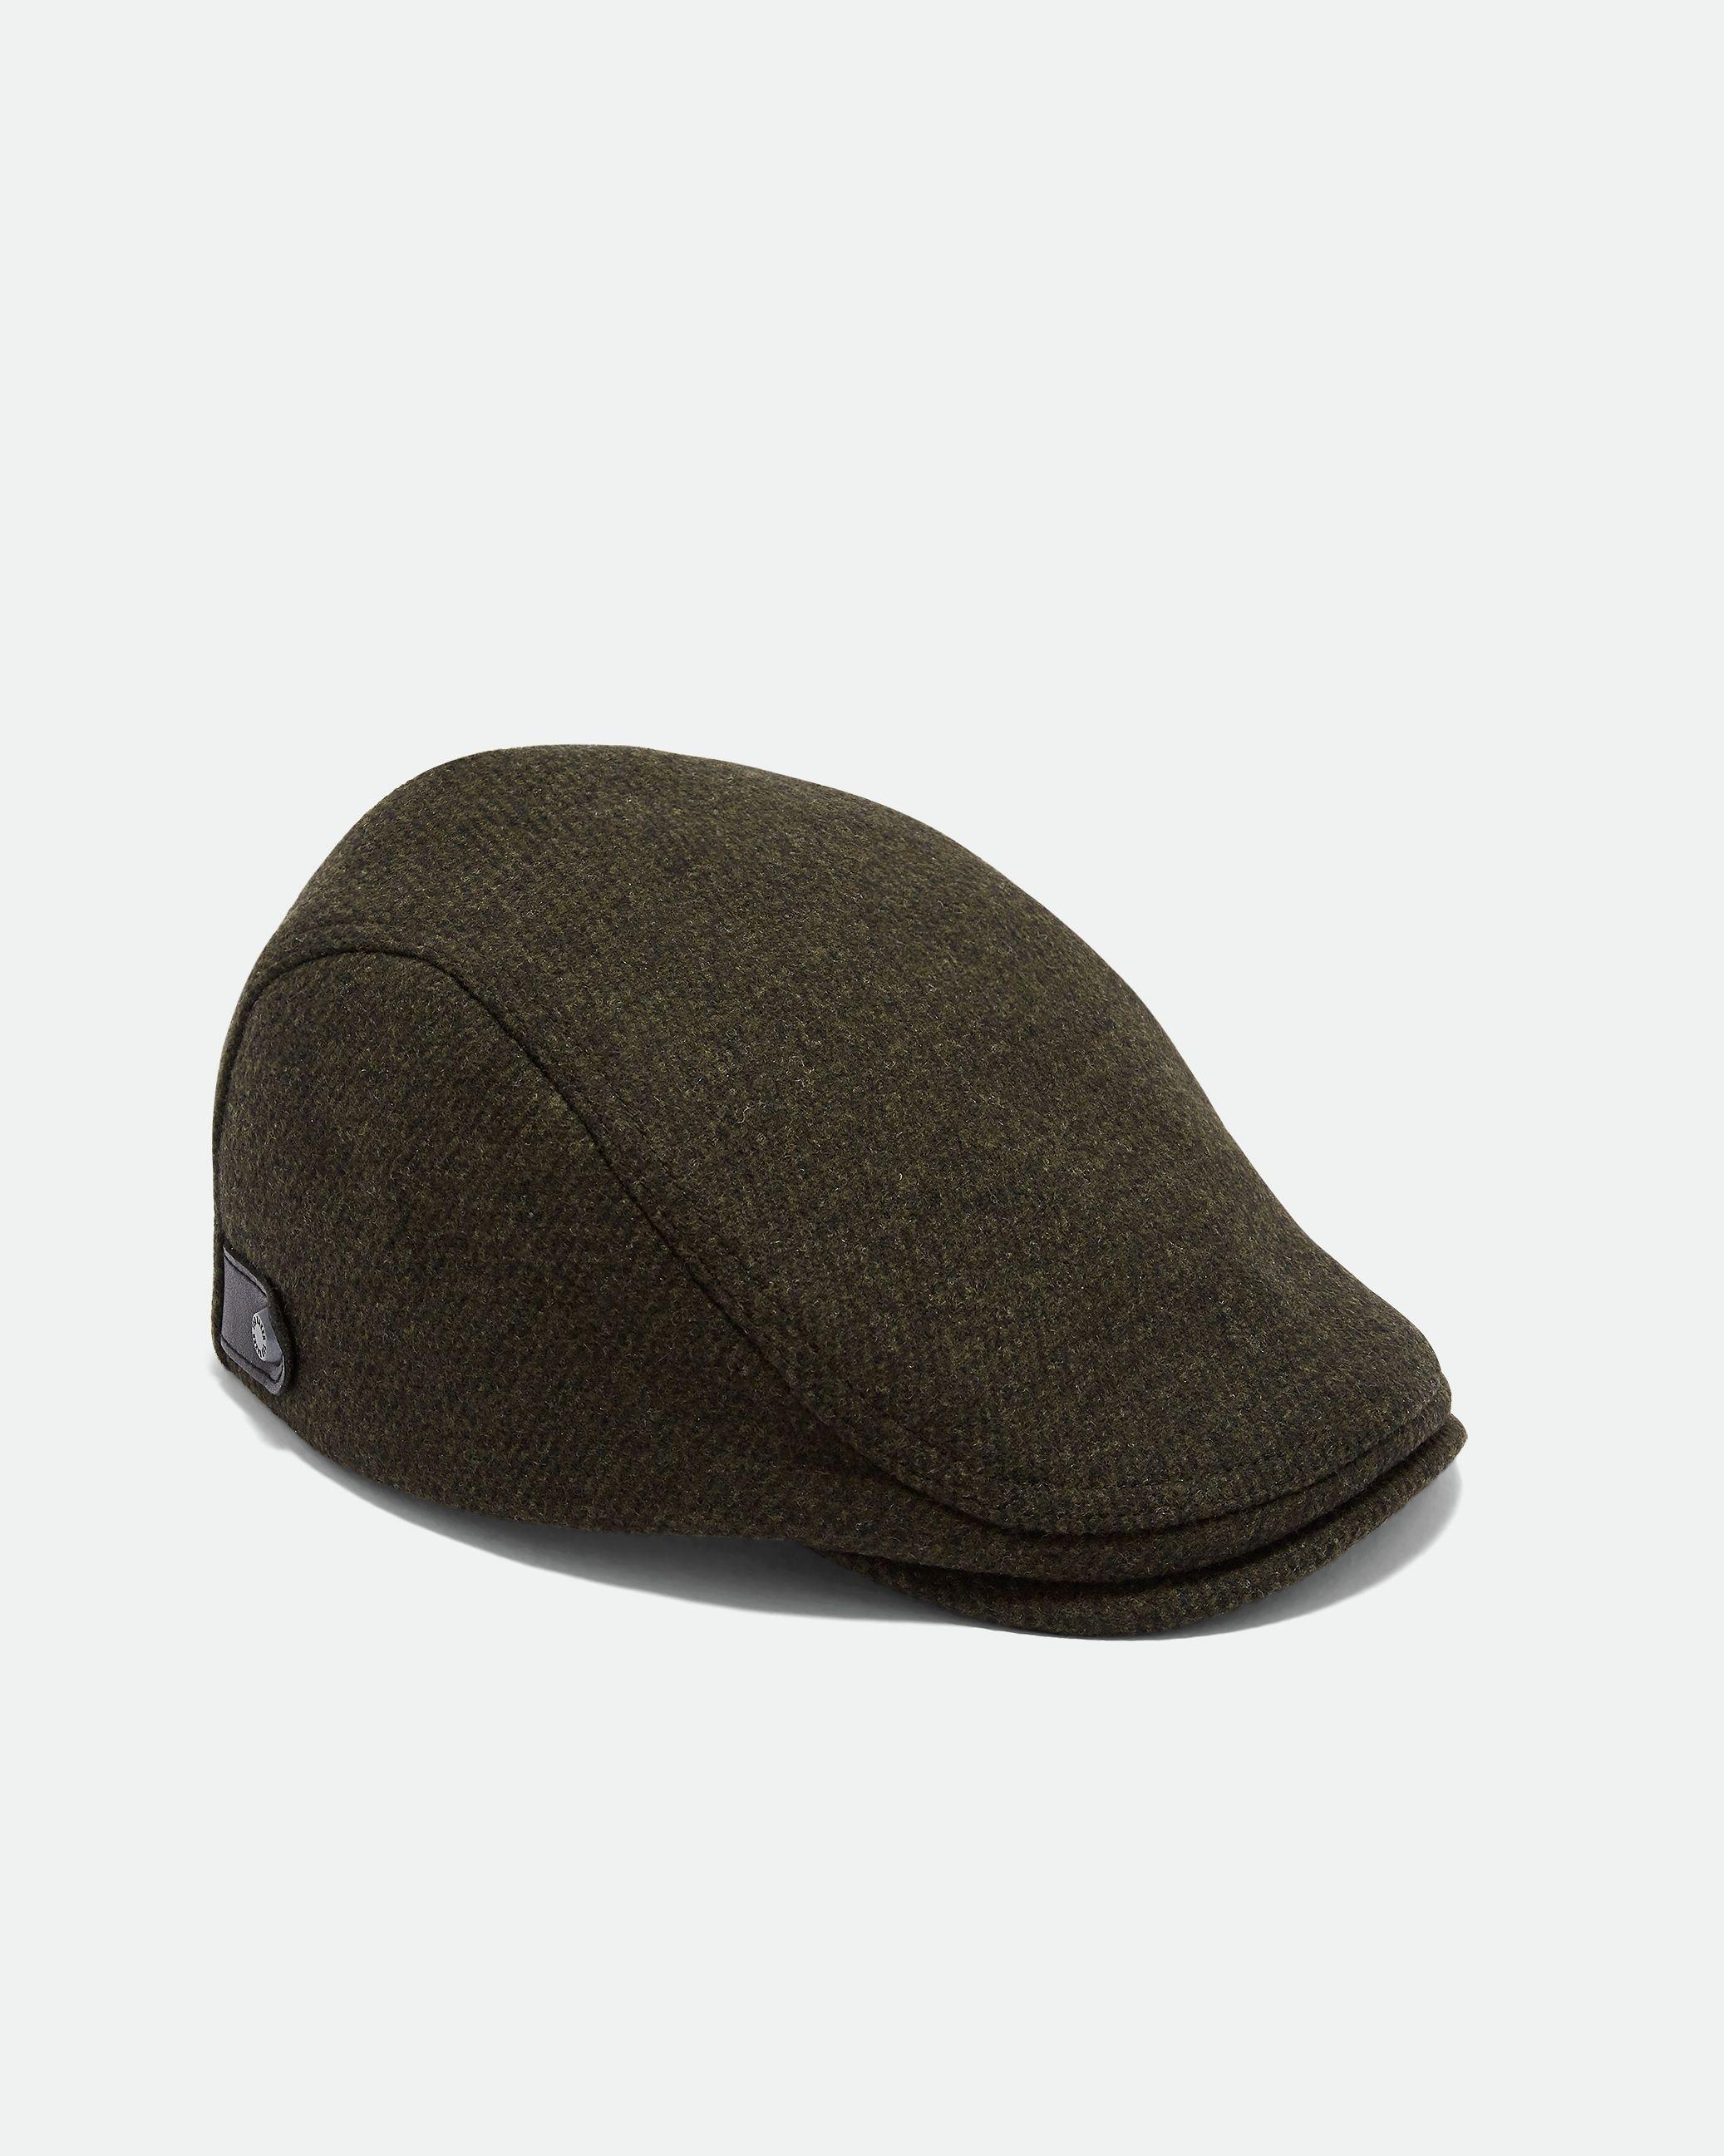 Ted Baker English Twill Flat Cap, Khaki